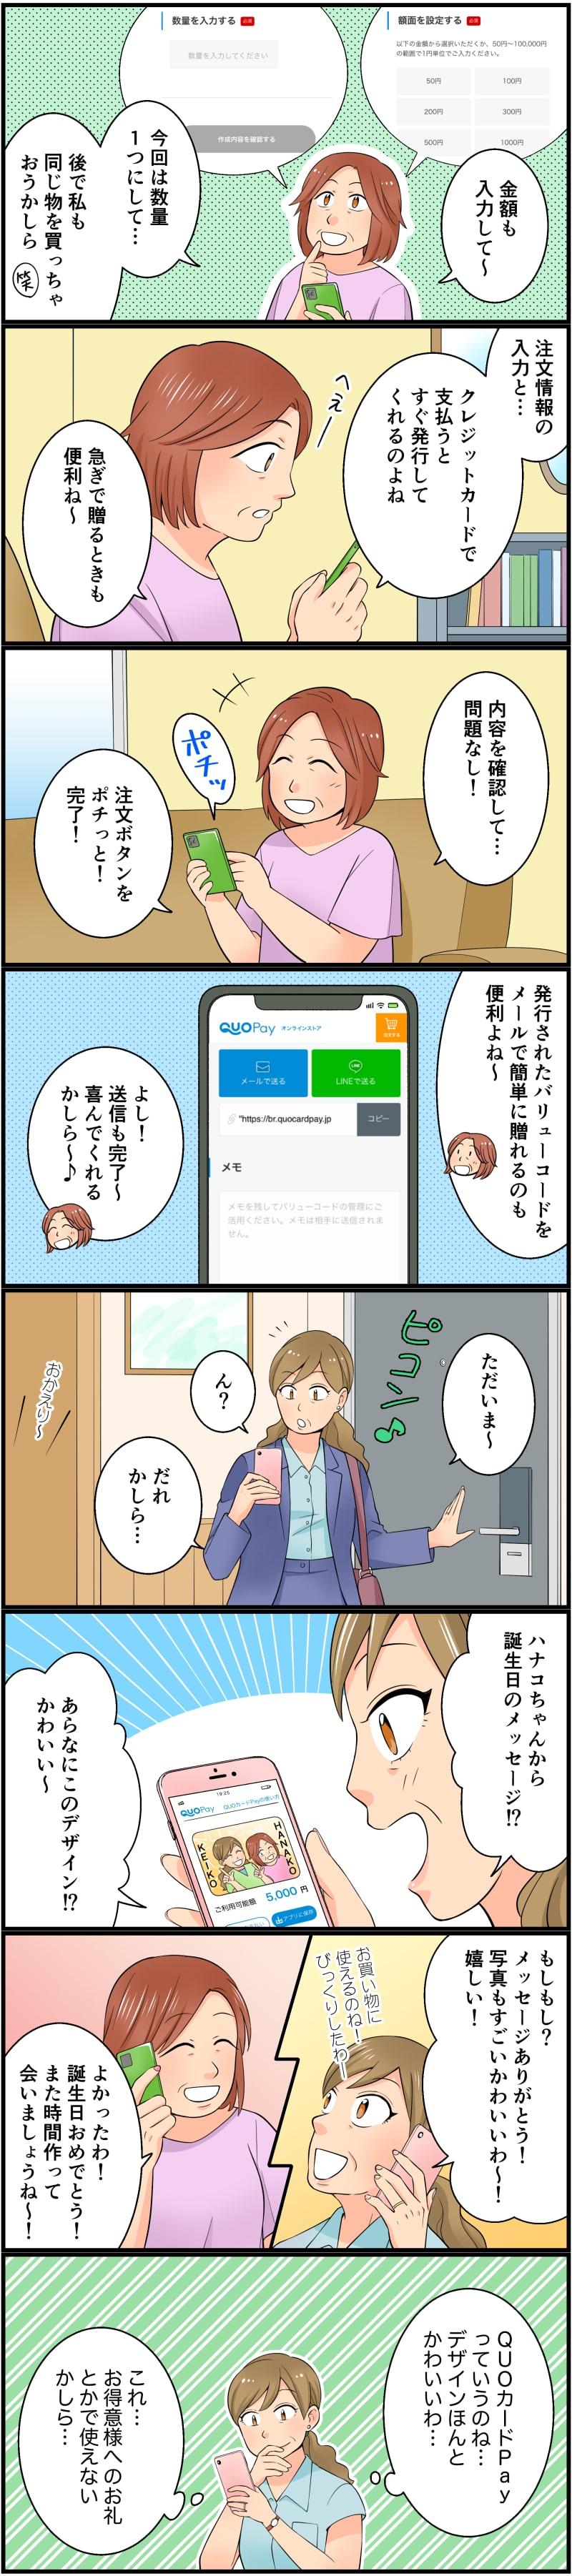 QUOカードPay 縦読み漫画『QUOカードPayの購入方法 個人編』掲載サンプル2